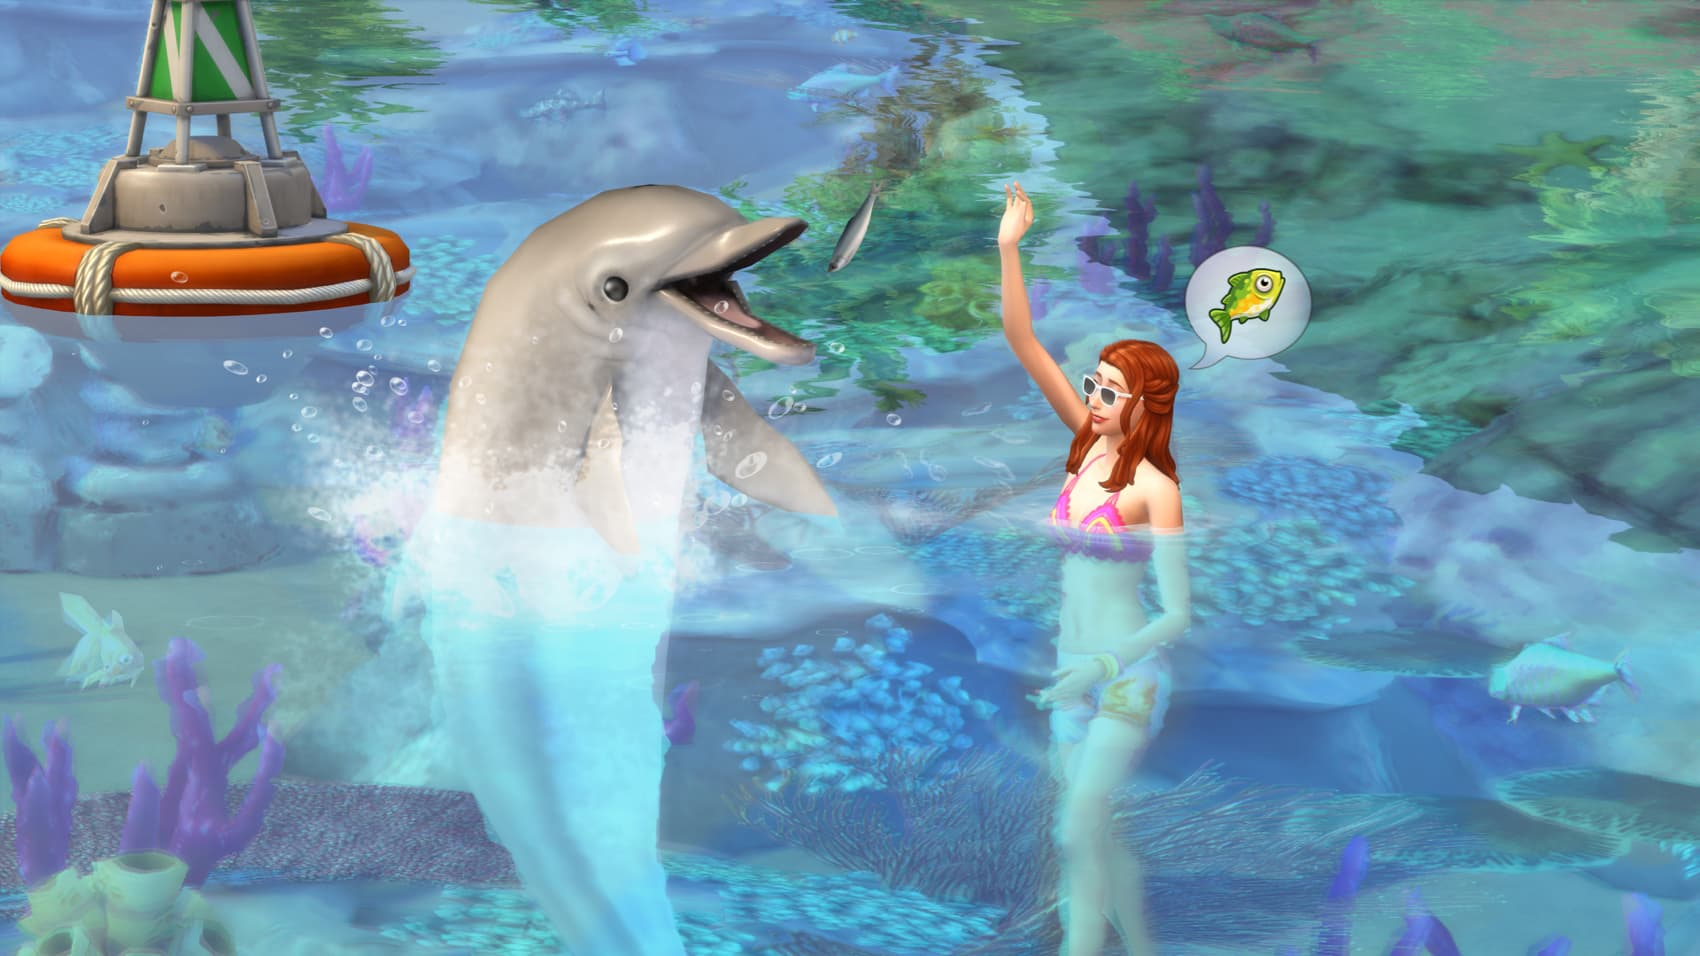 Les Sims 4: Iles paradisiaques Xbox One